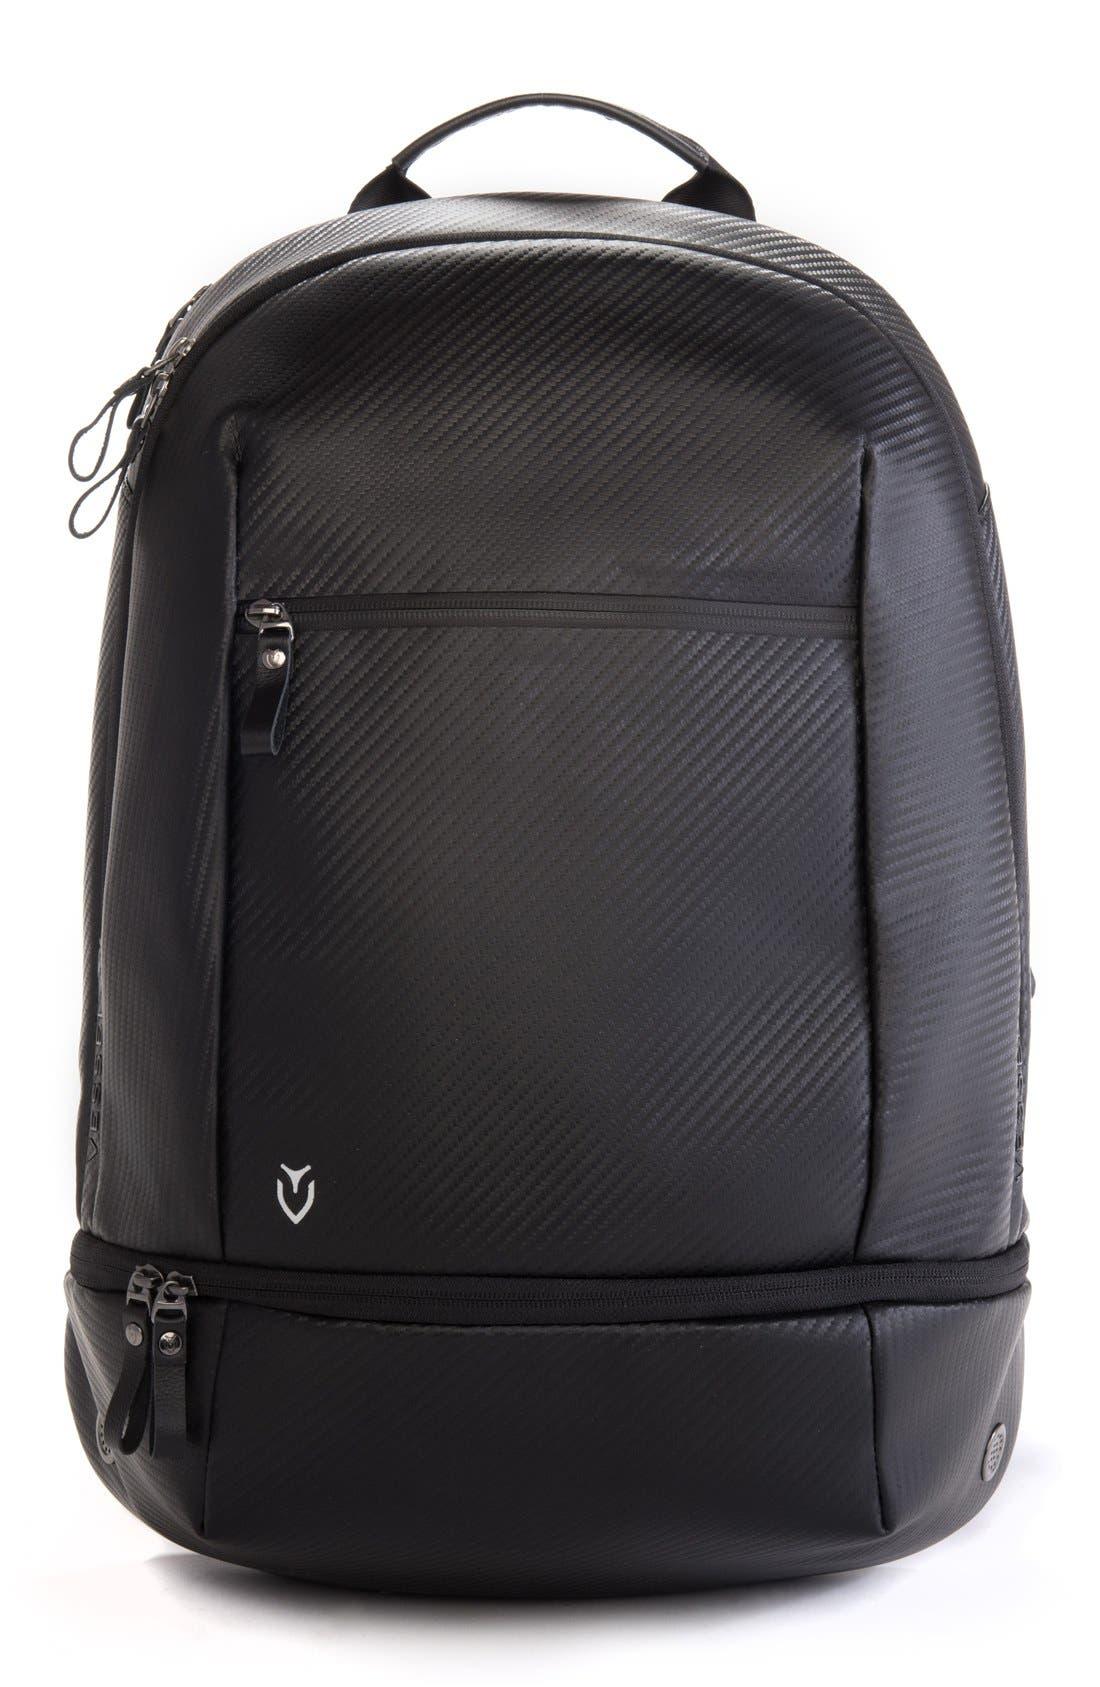 Main Image - Vessel 'Signature' Backpack